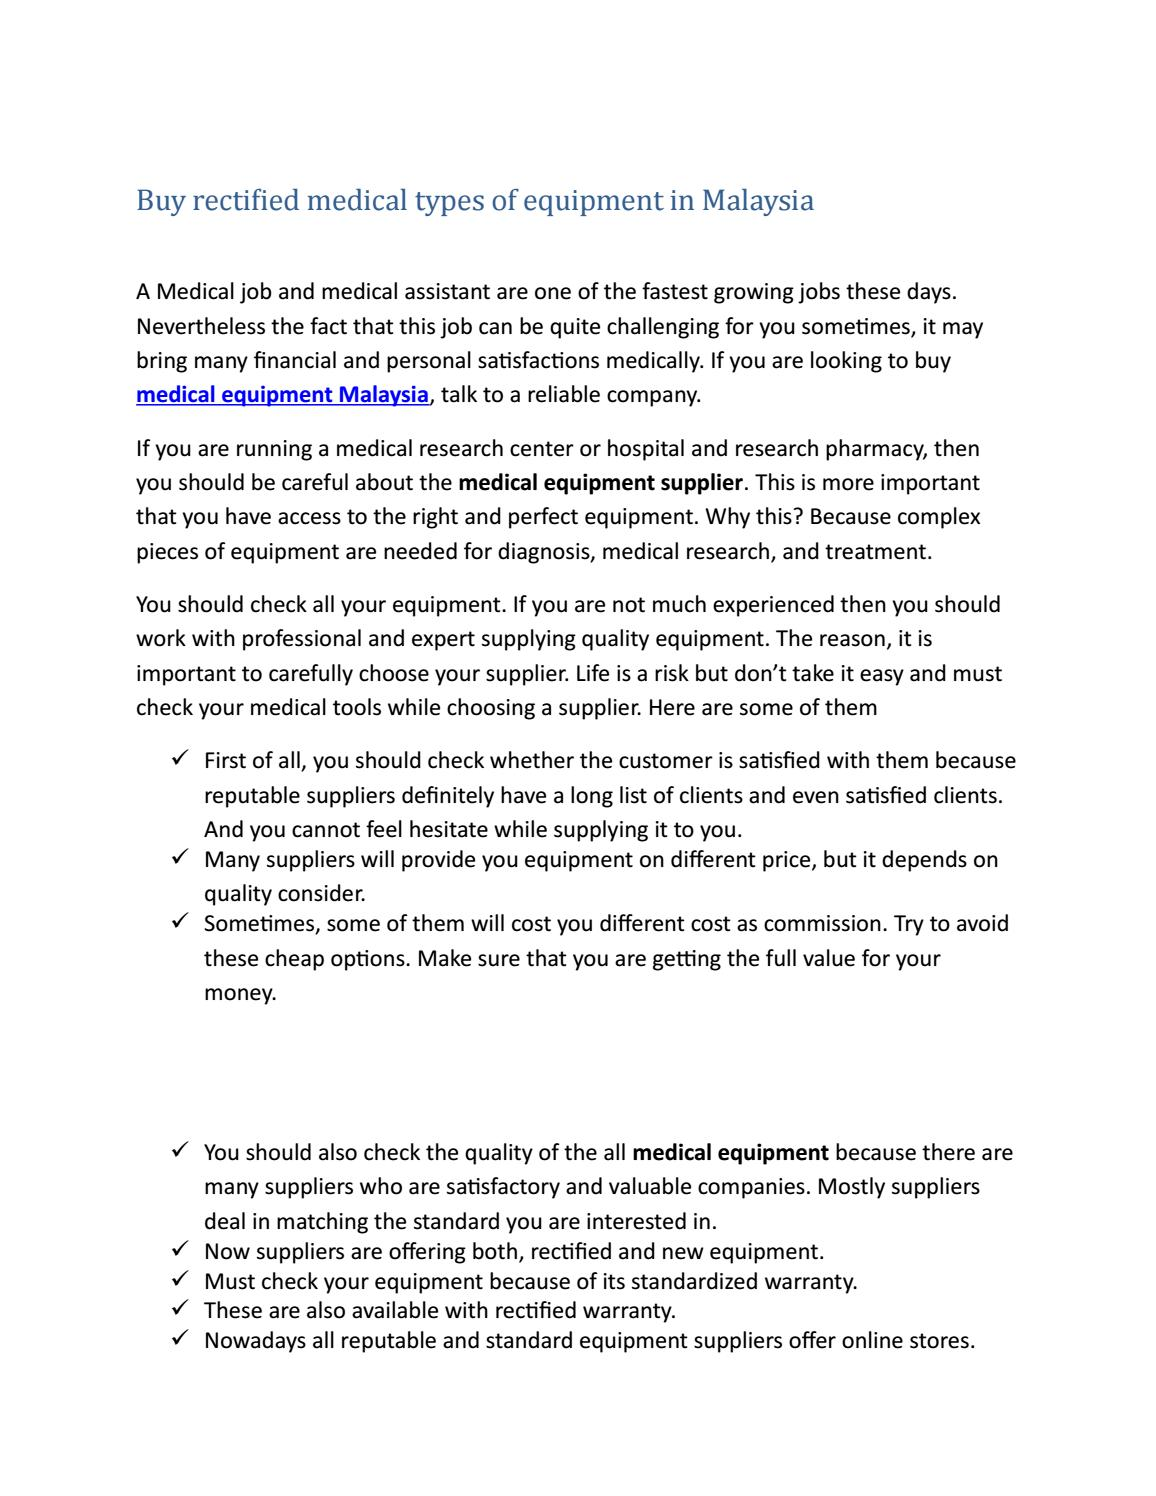 Medical equipment malaysia by GA 2 Medical - issuu